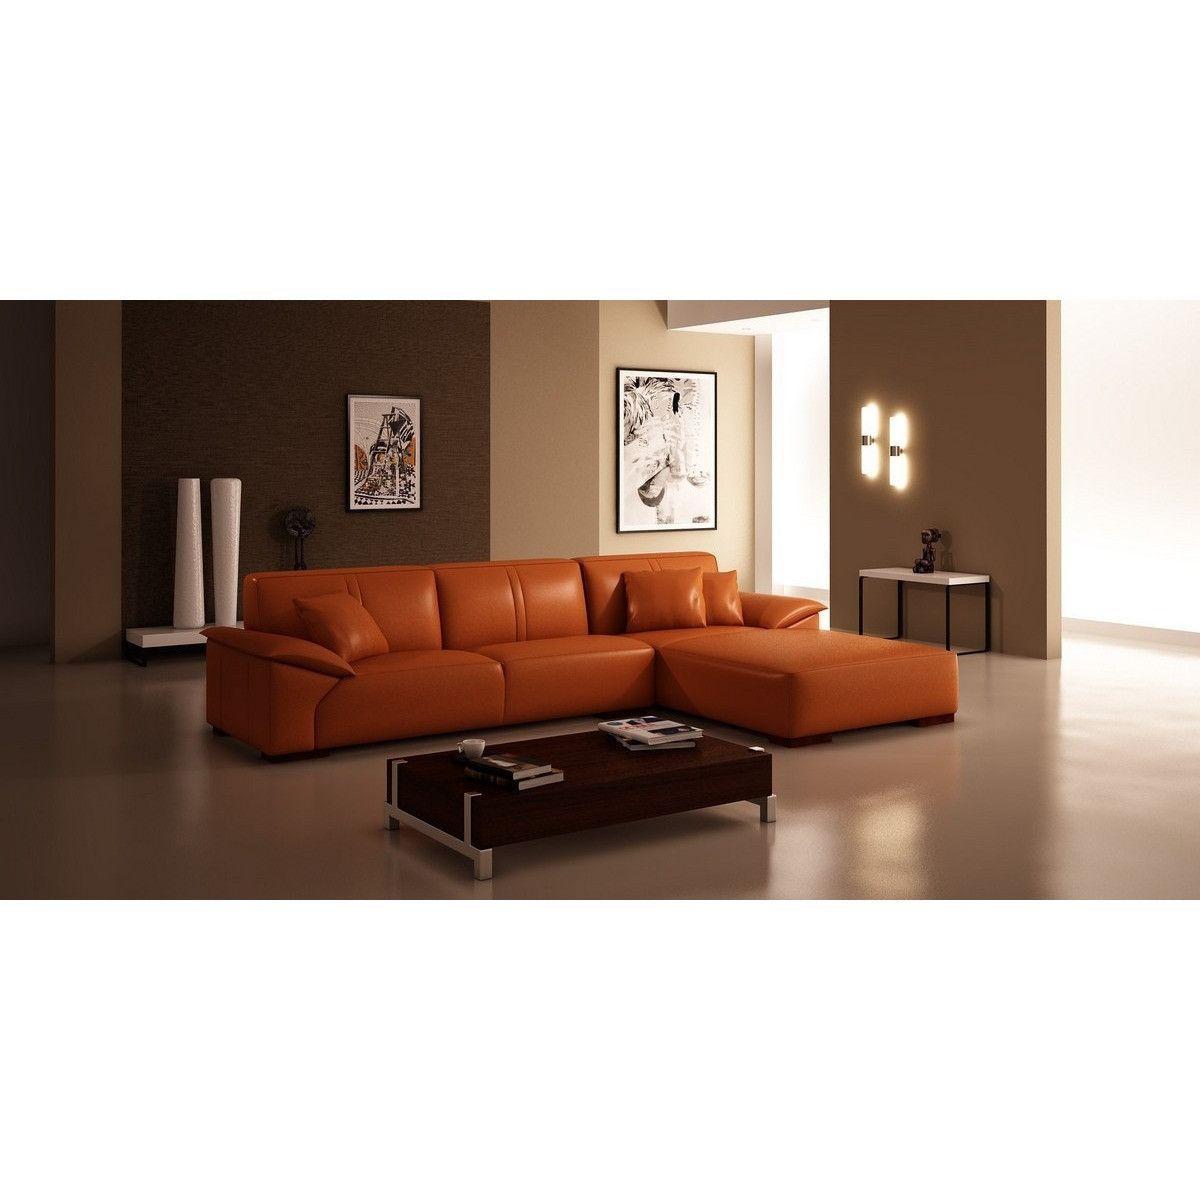 Divani Casa 5043 Modern Orange Bonded Leather Sectional Sofa ...